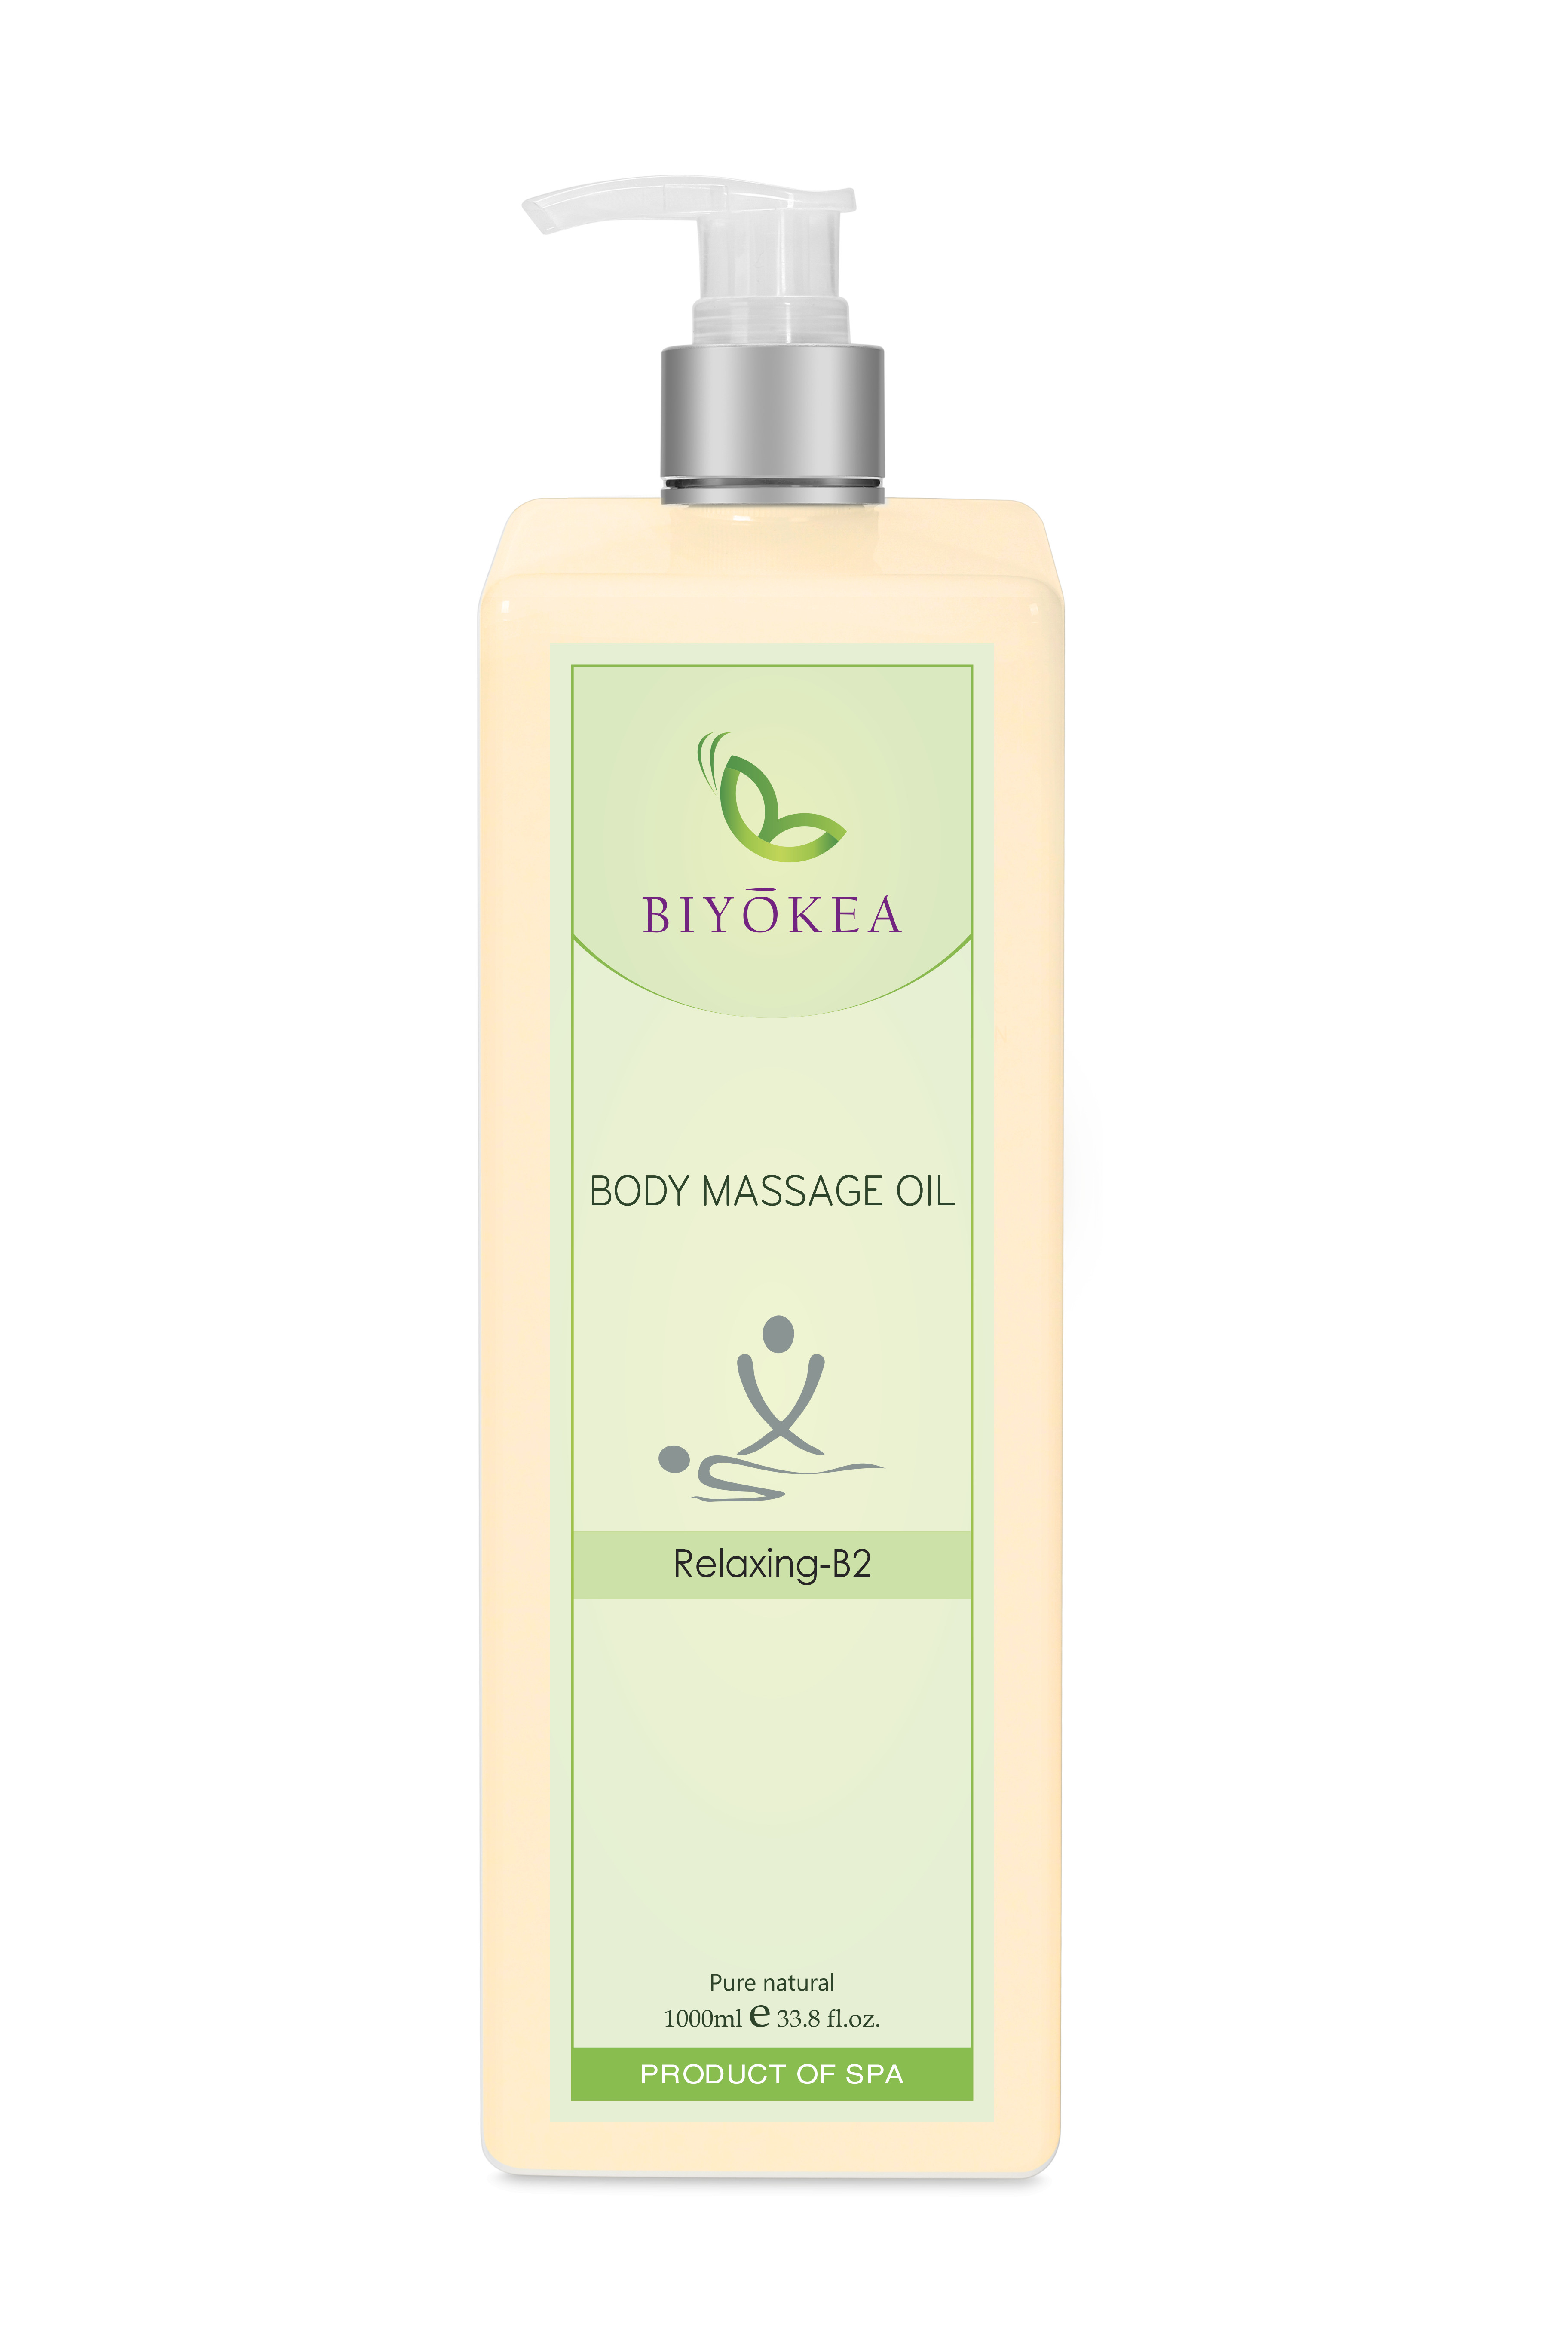 Dầu Massage Body Biyokea - Relaxing B2 (thư giãn) - 1000ml